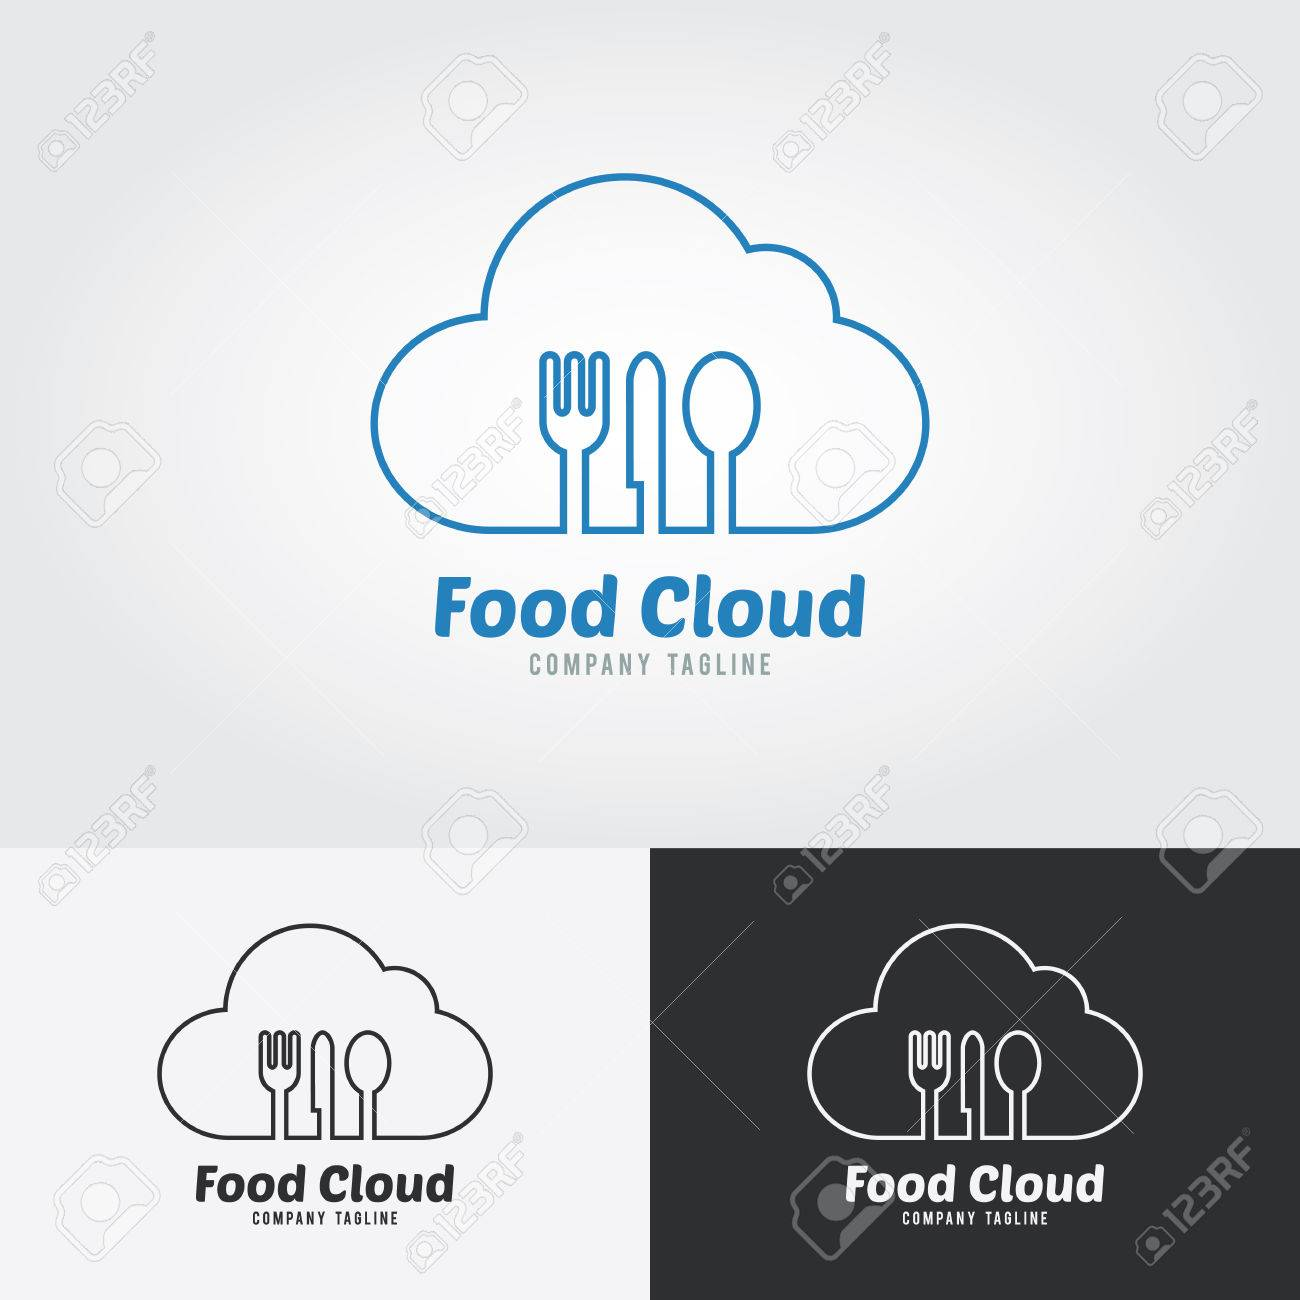 Perfect Lebensmittel Log Vorlage Pattern - FORTSETZUNG ARBEITSBLATT ...